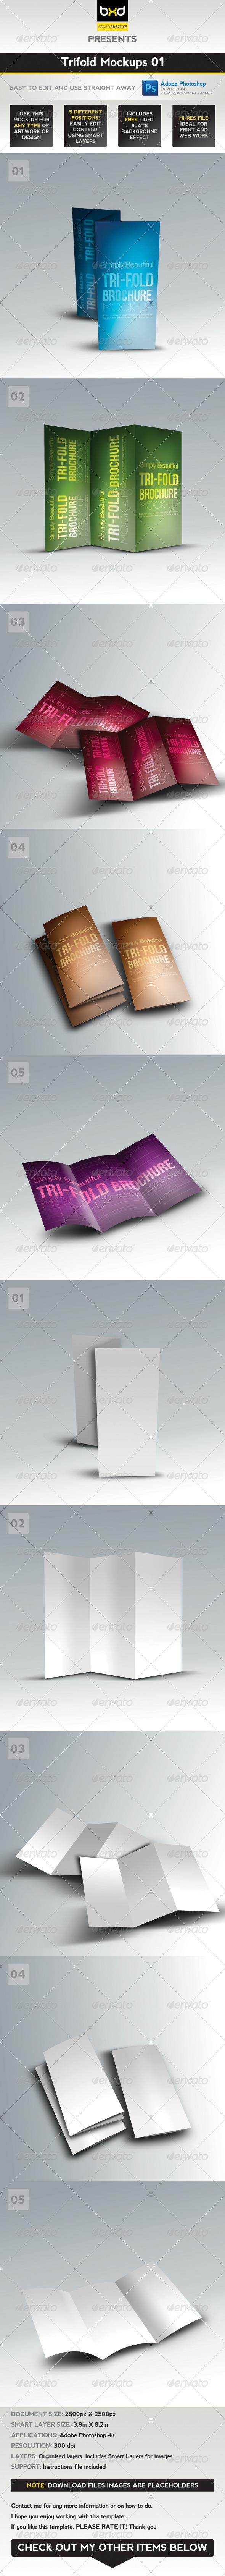 Trifold Brochure Mock-ups 01 - Brochures Print